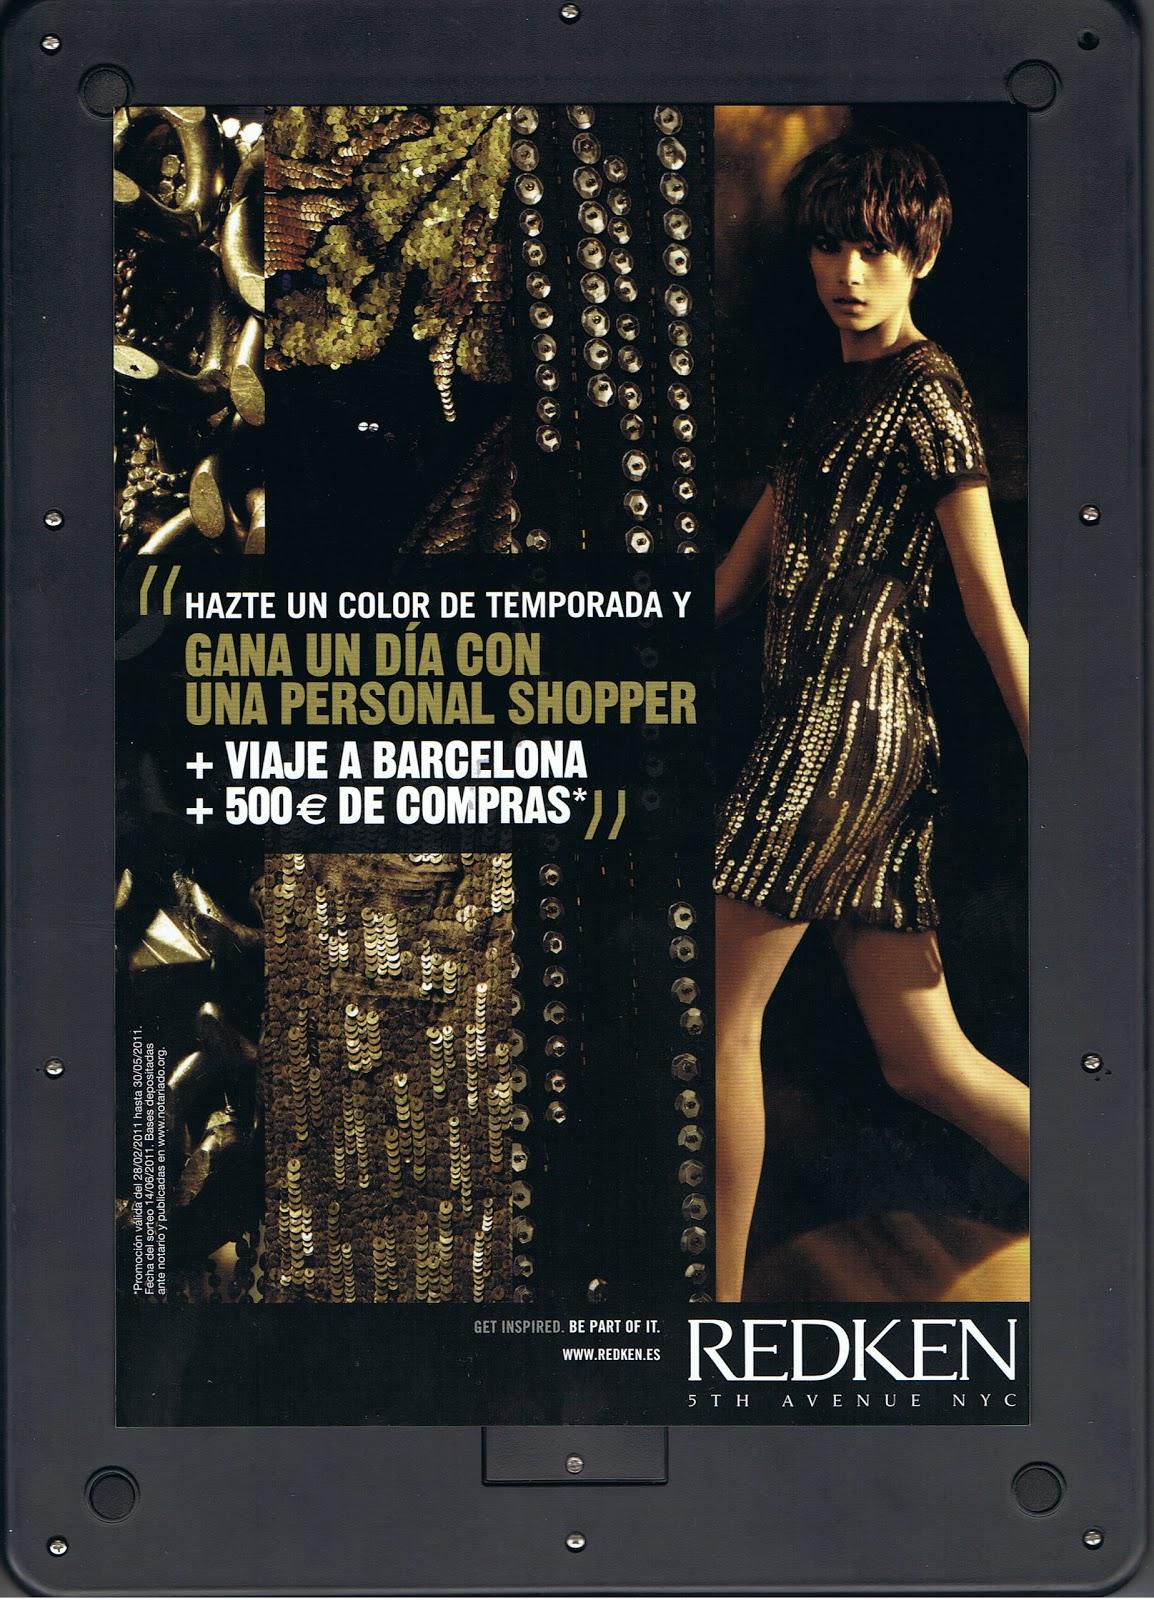 Barcelona discount coupons